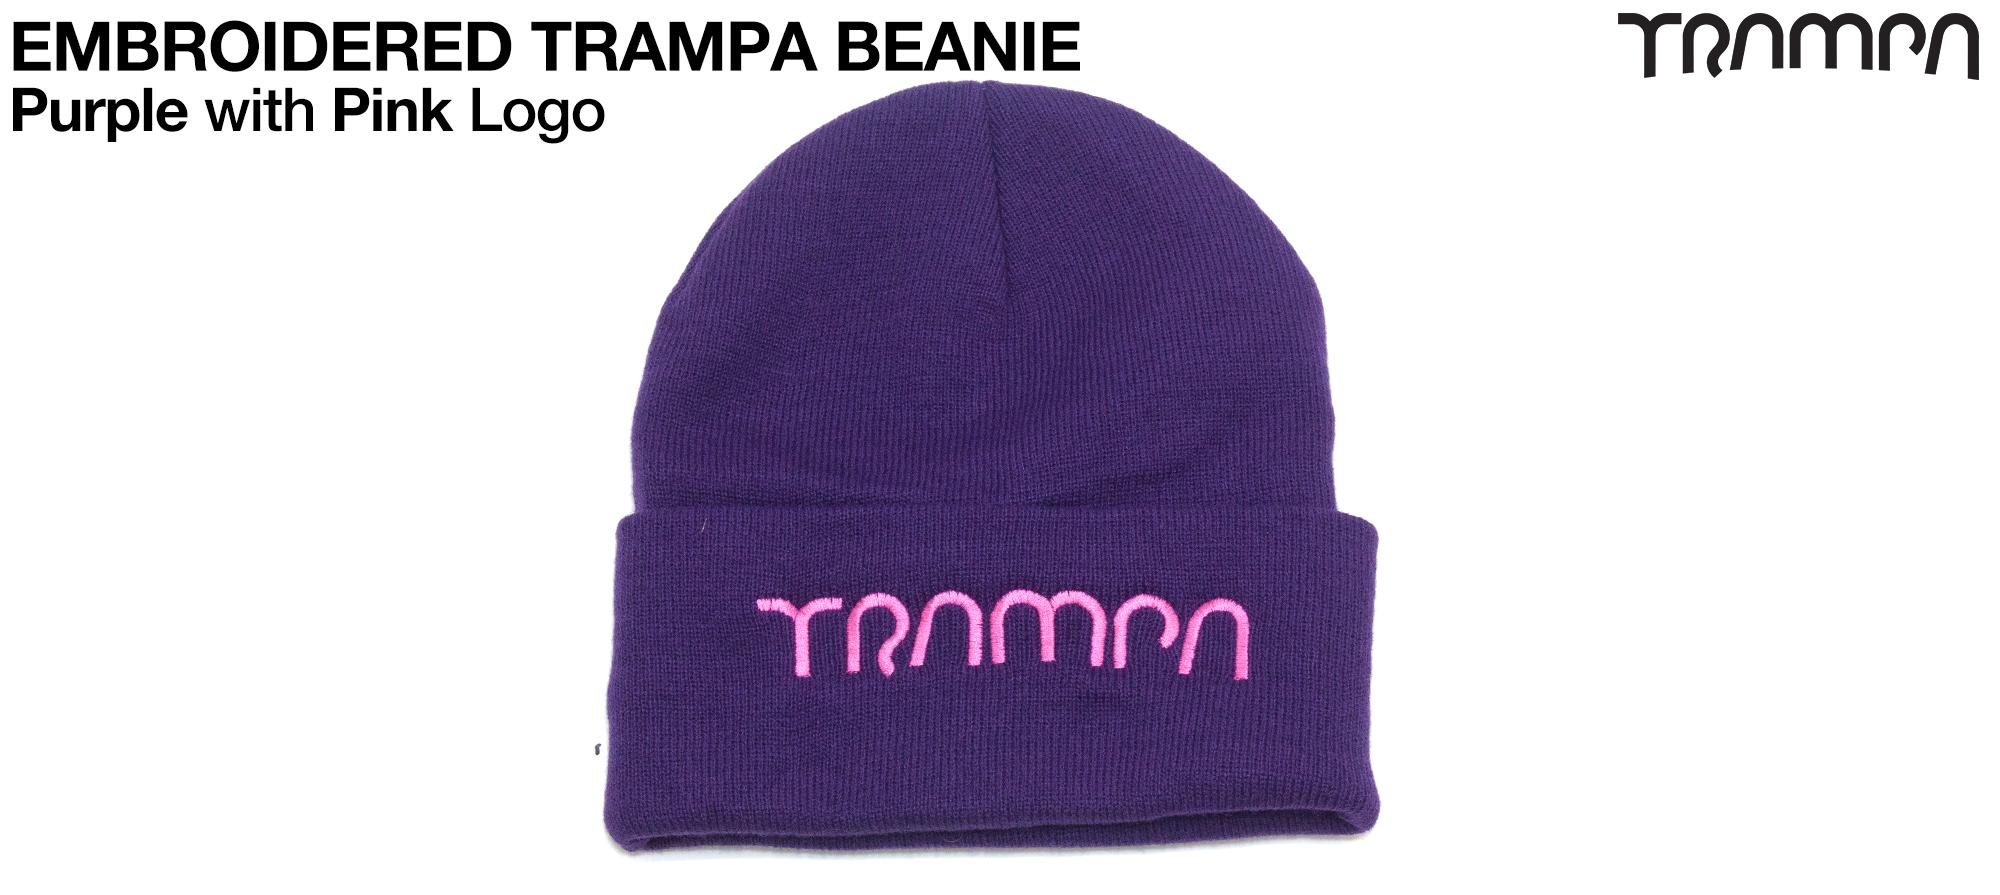 PURPLE Woolie hat with PINK TRAMPA logo